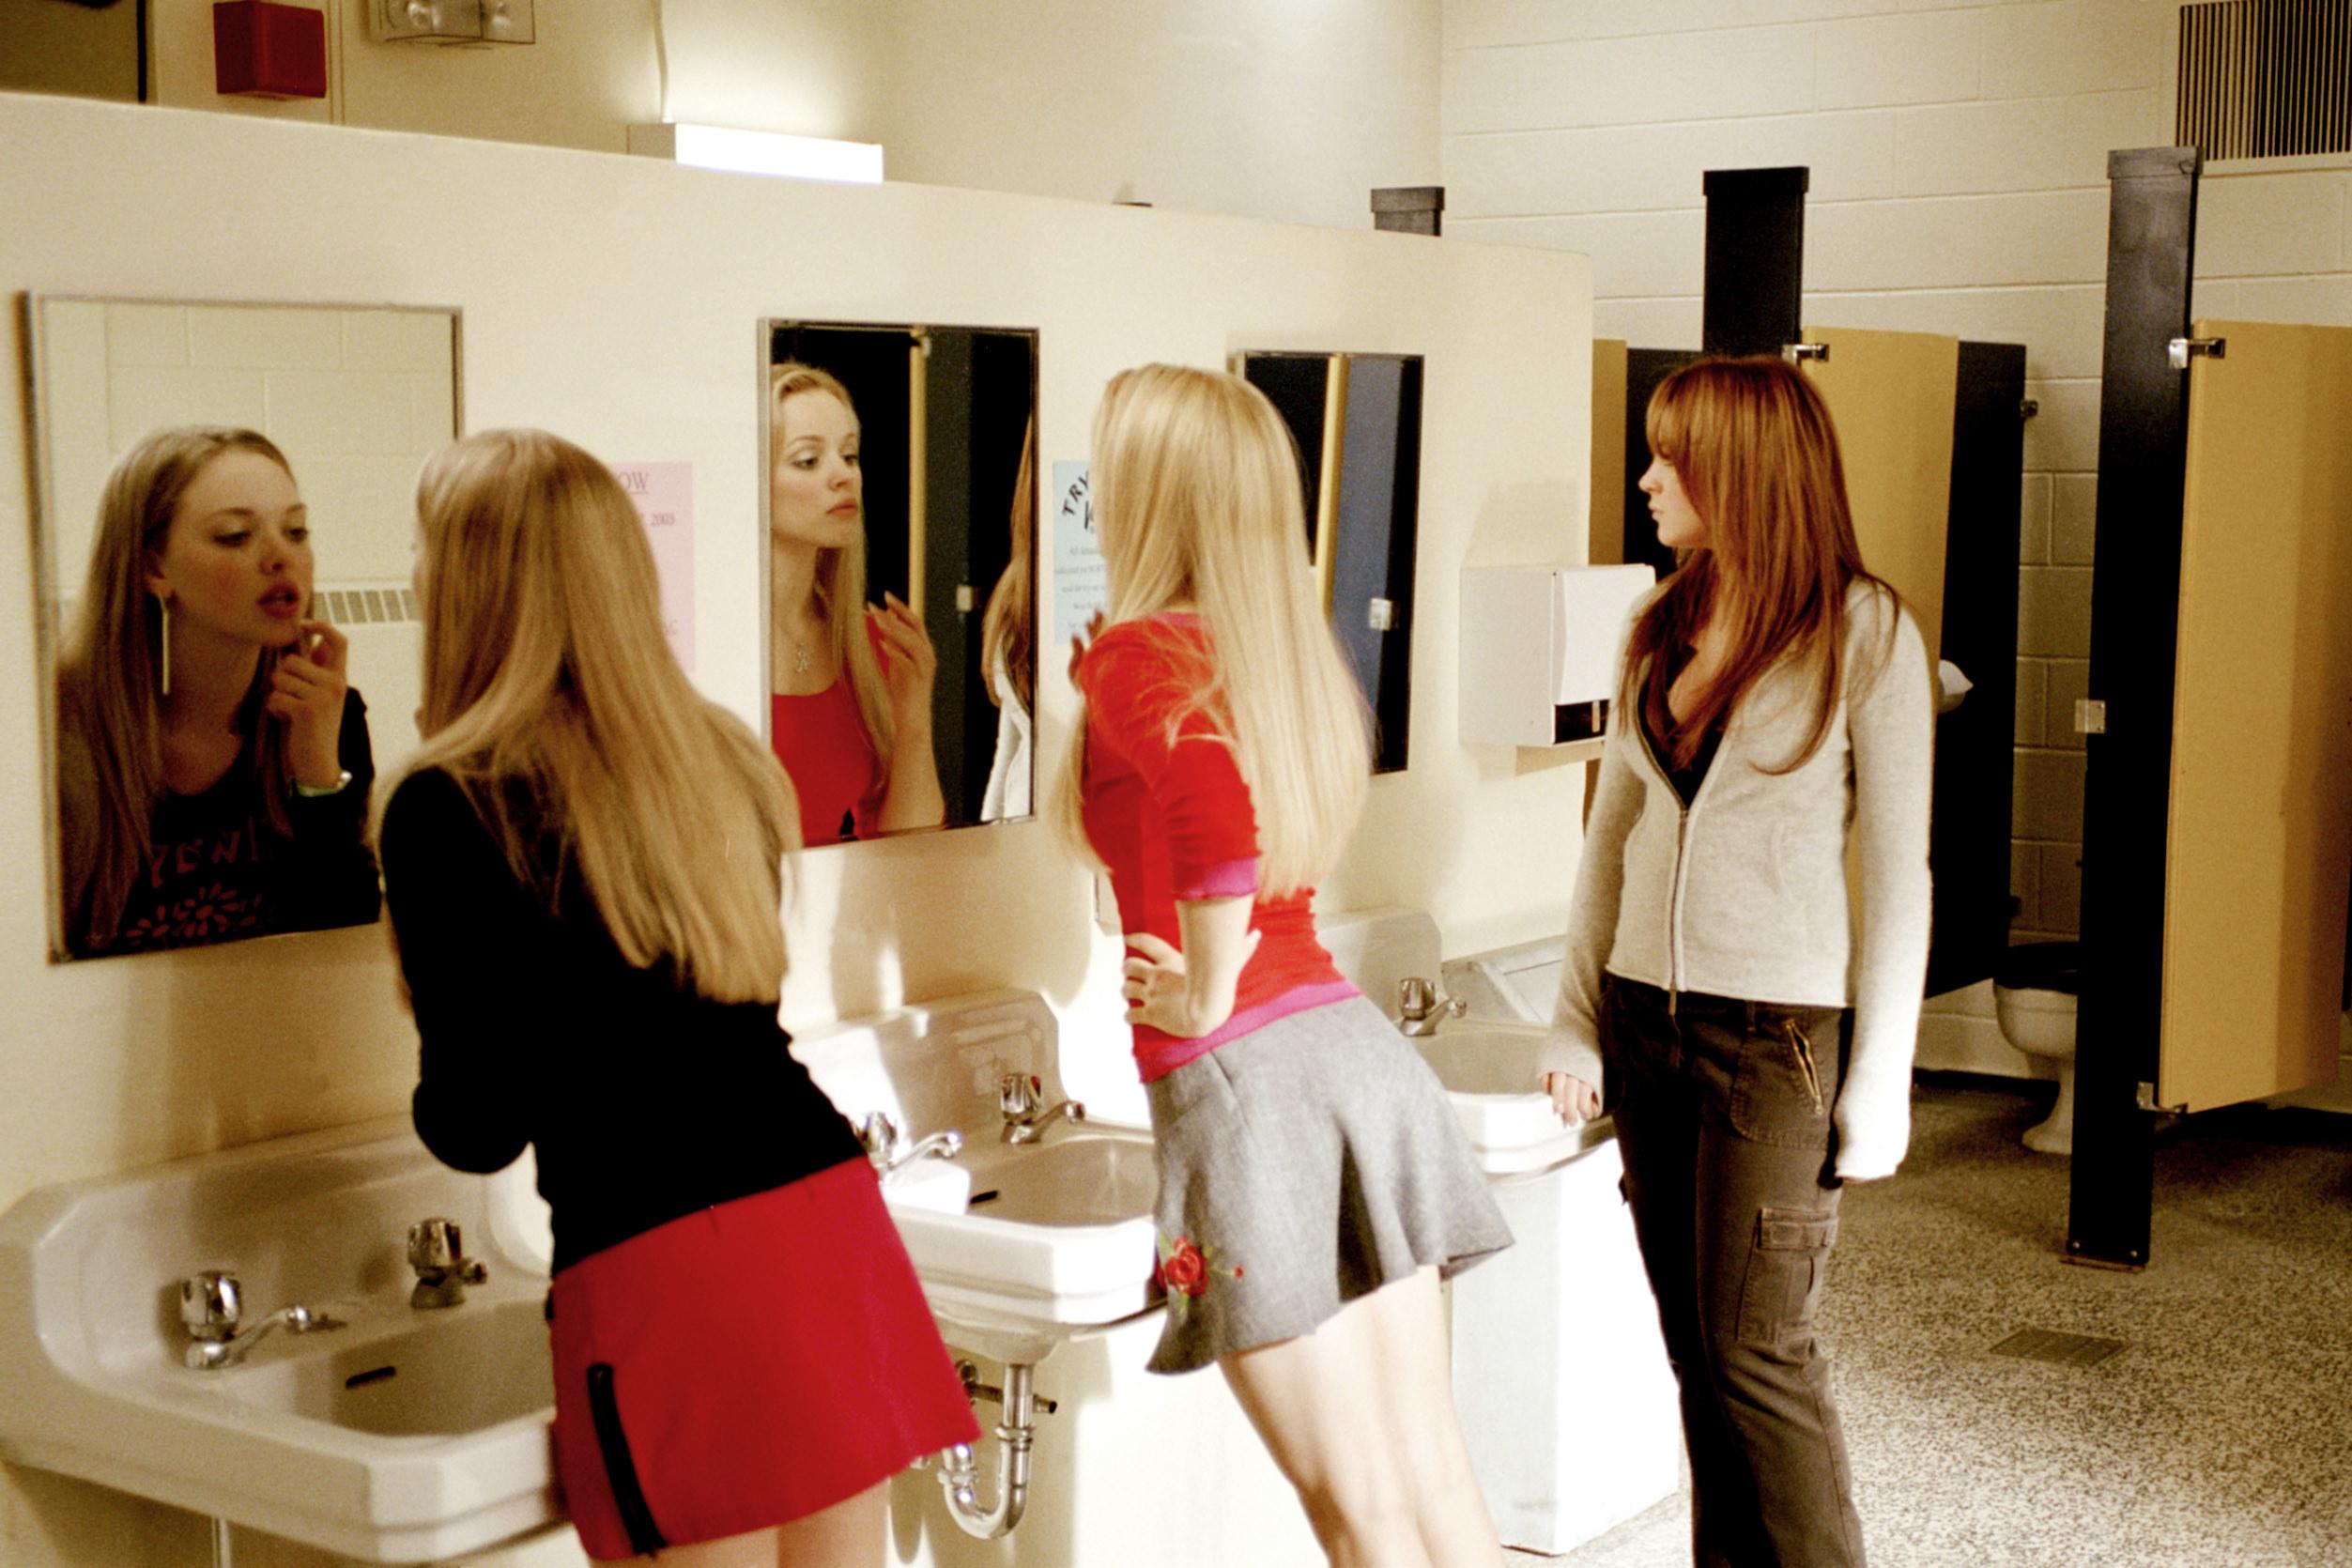 Karen and Regina fix their makeup in the bathroom mirrors